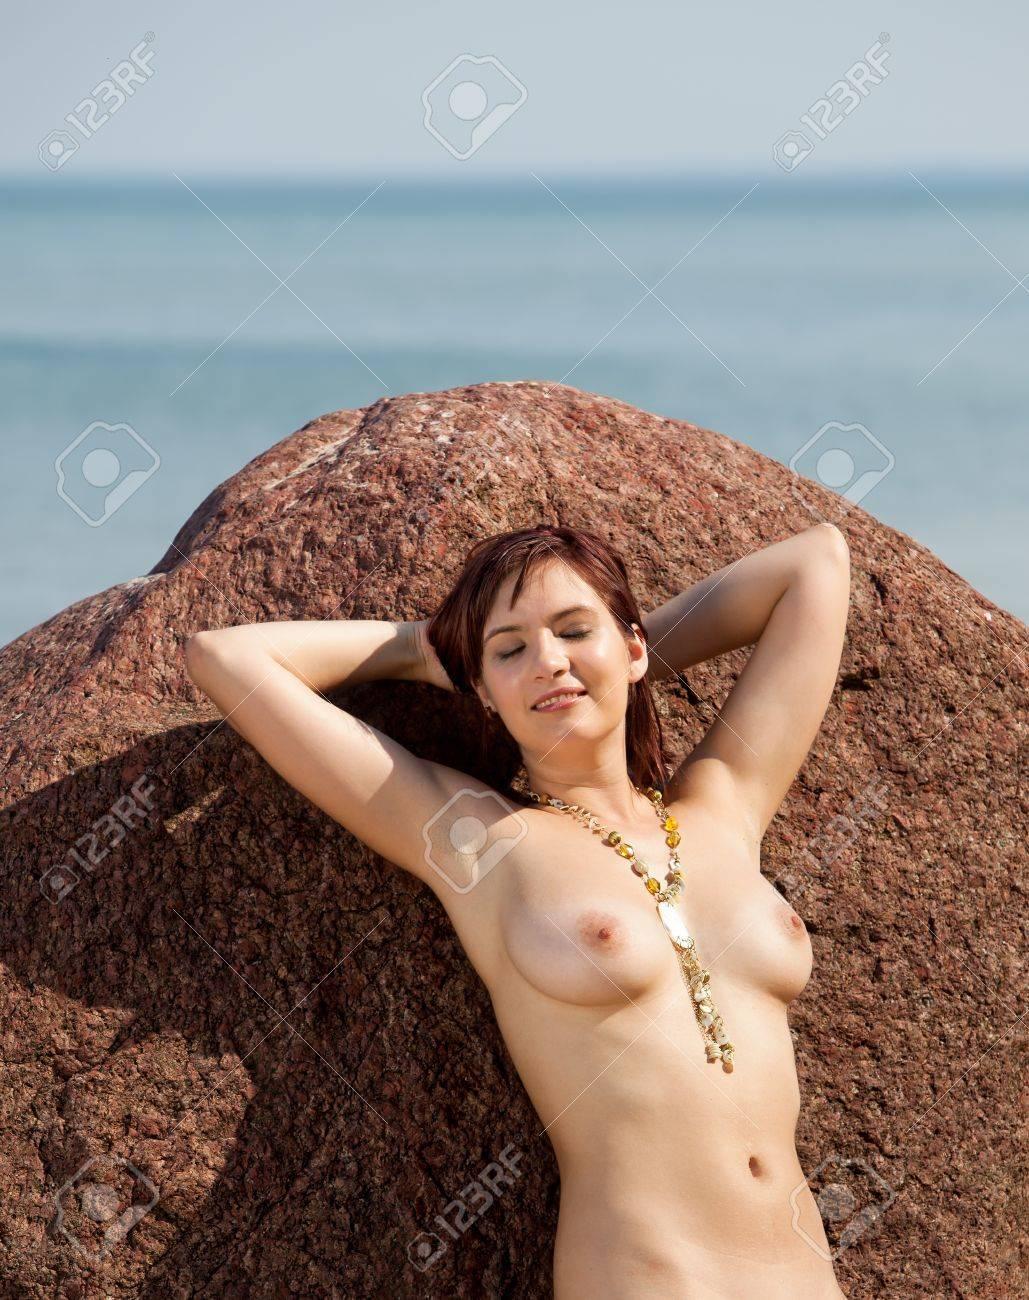 Young naked woman sunbathing near the stone on sea background Stock Photo - 12913939